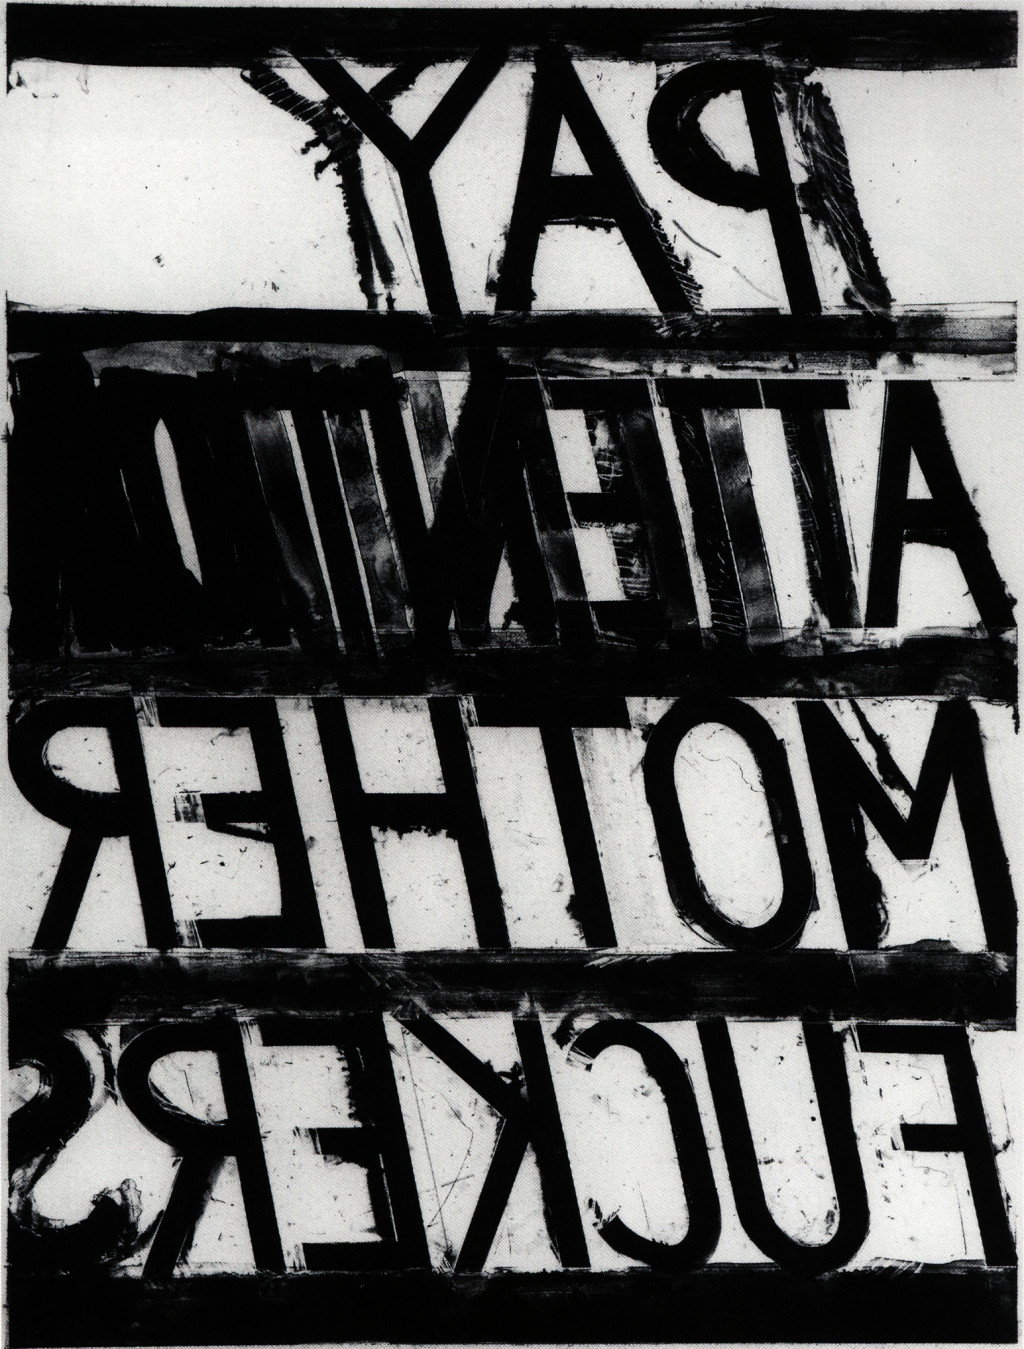 Bruce Nauman, 'Pay Attention', 1973. Uitgegeven door Gemini G.E.L. Courtesy Sperone Westwater, New York. © 2021 Bruce Nauman / Pictoright Amsterdam / Stedelijk Museum Amsterdam